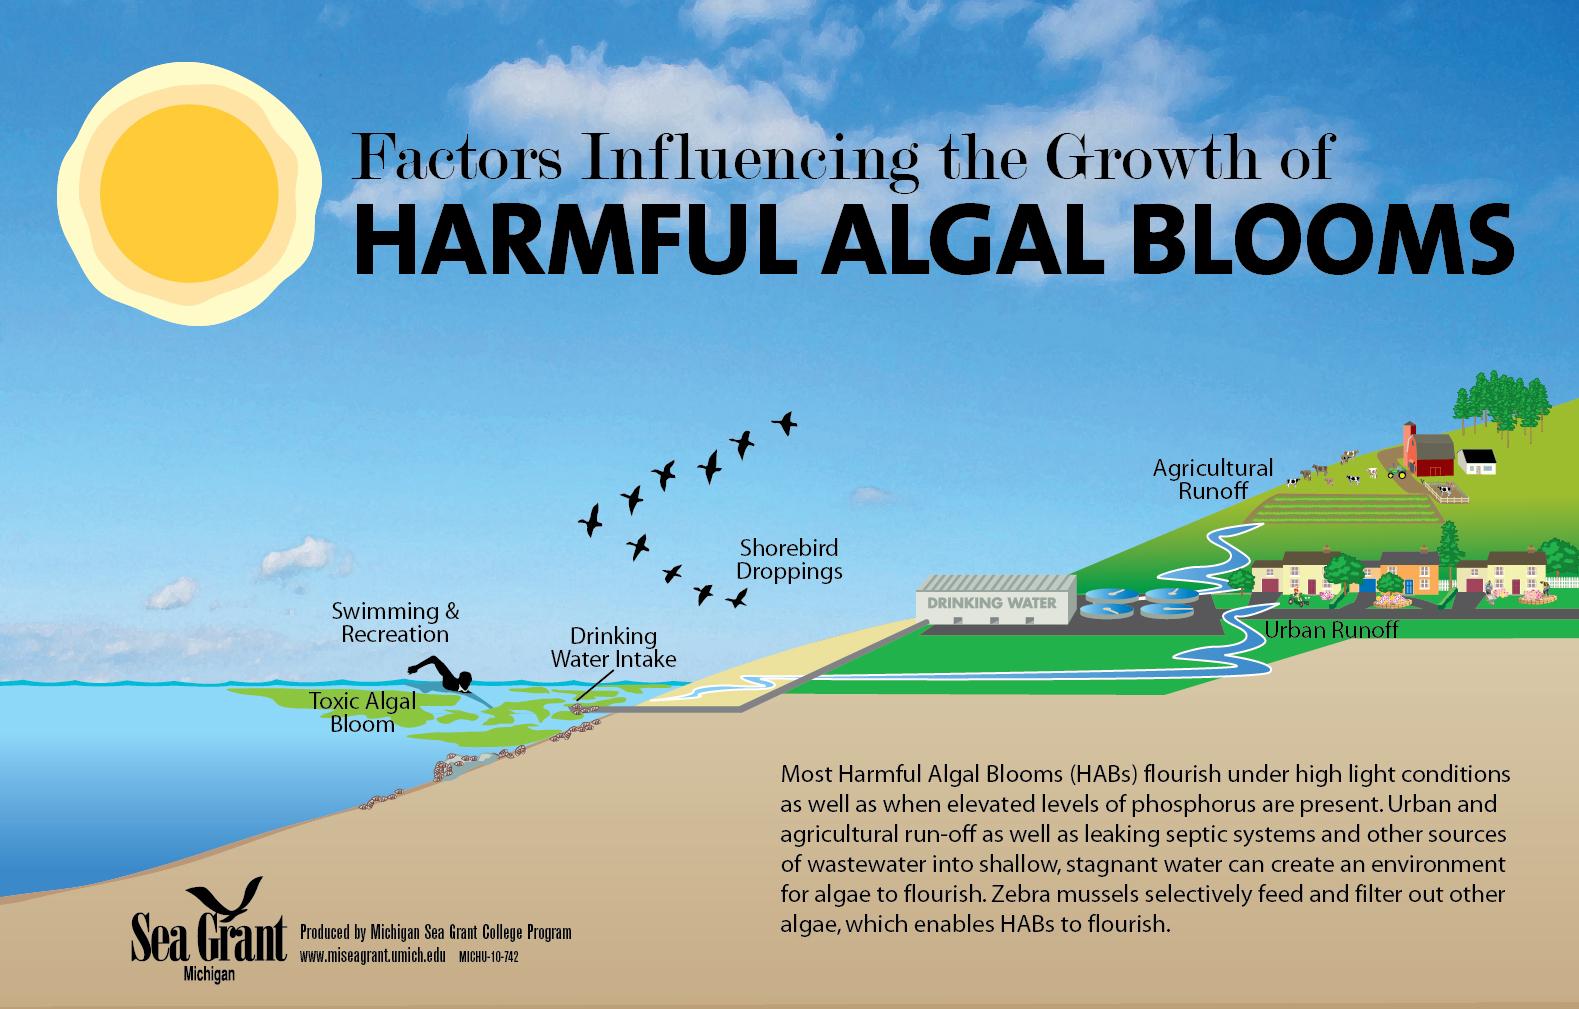 Harmful Algal Blooms in the Great Lakes | Michigan Sea Grant